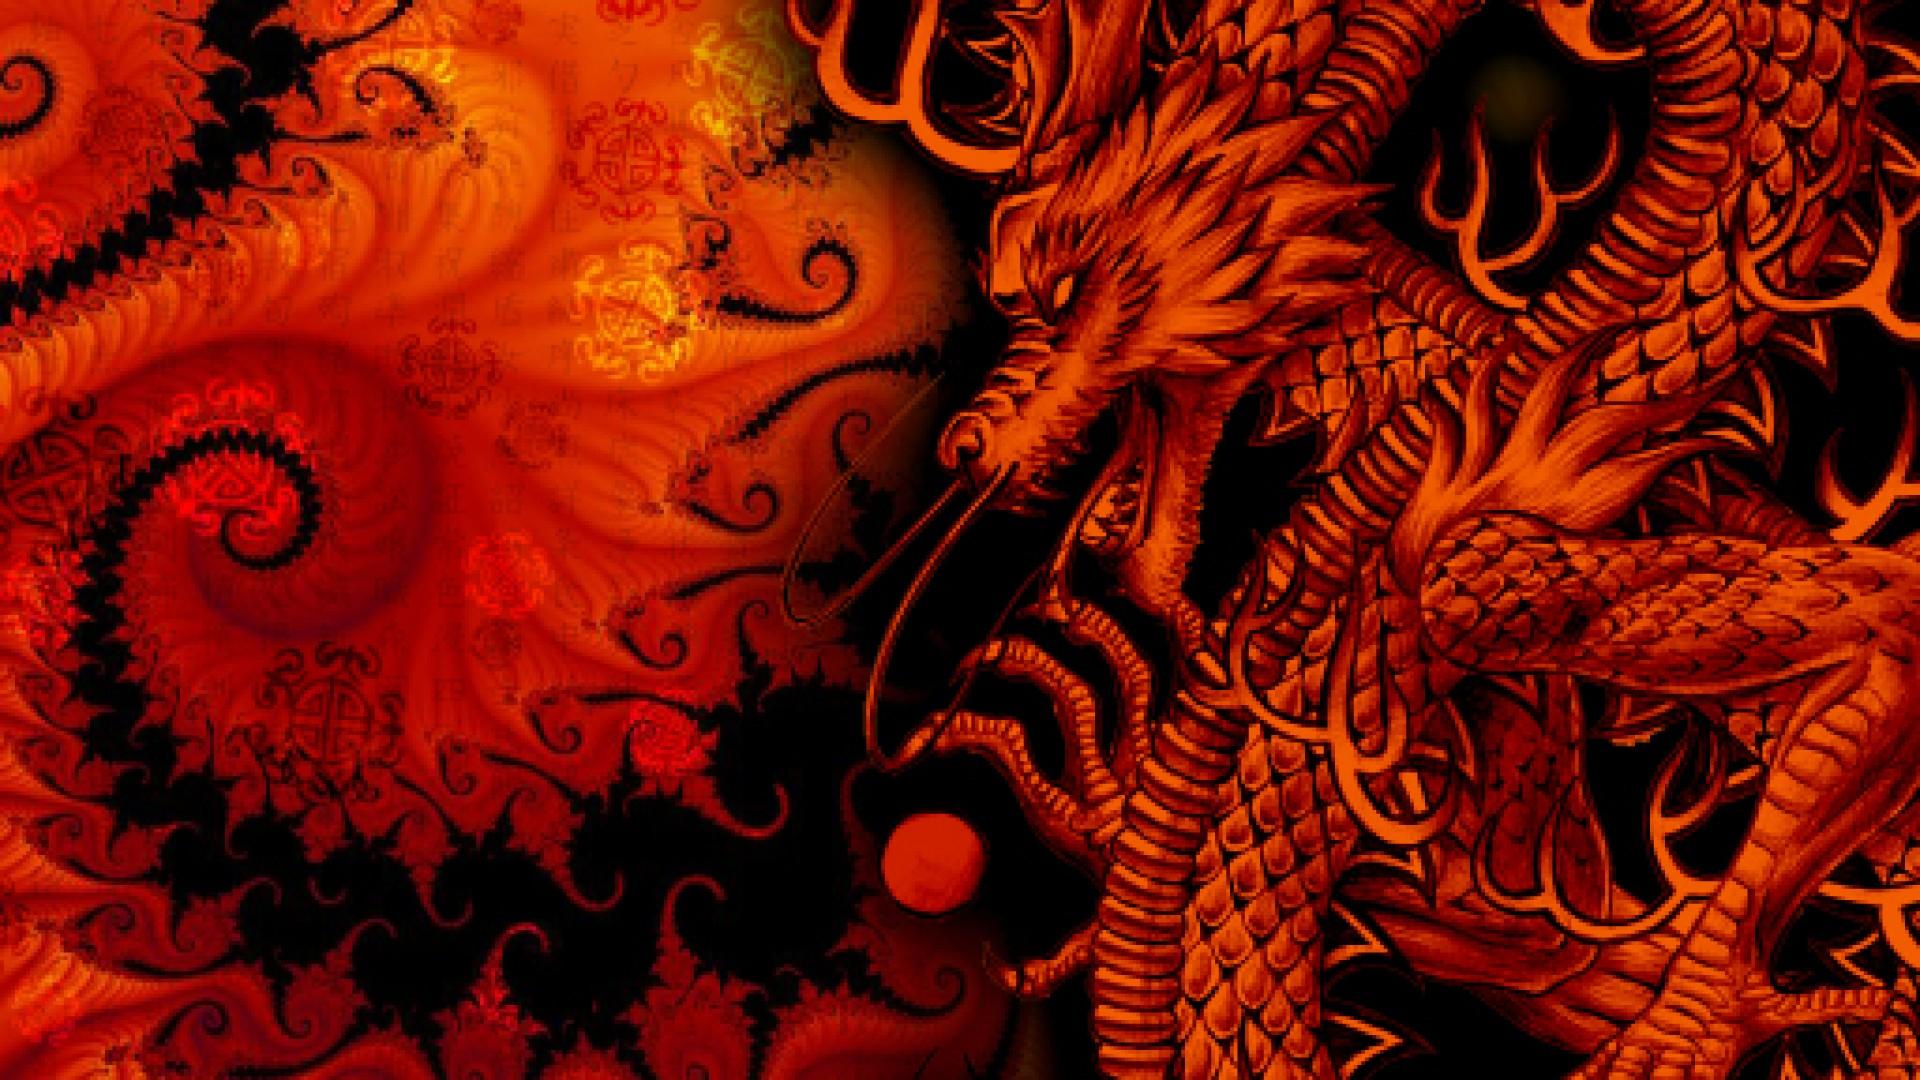 Dragon Wallpapers, Dragon Backgrounds, Dragon Images - Desktop Dragon pictures for desktop